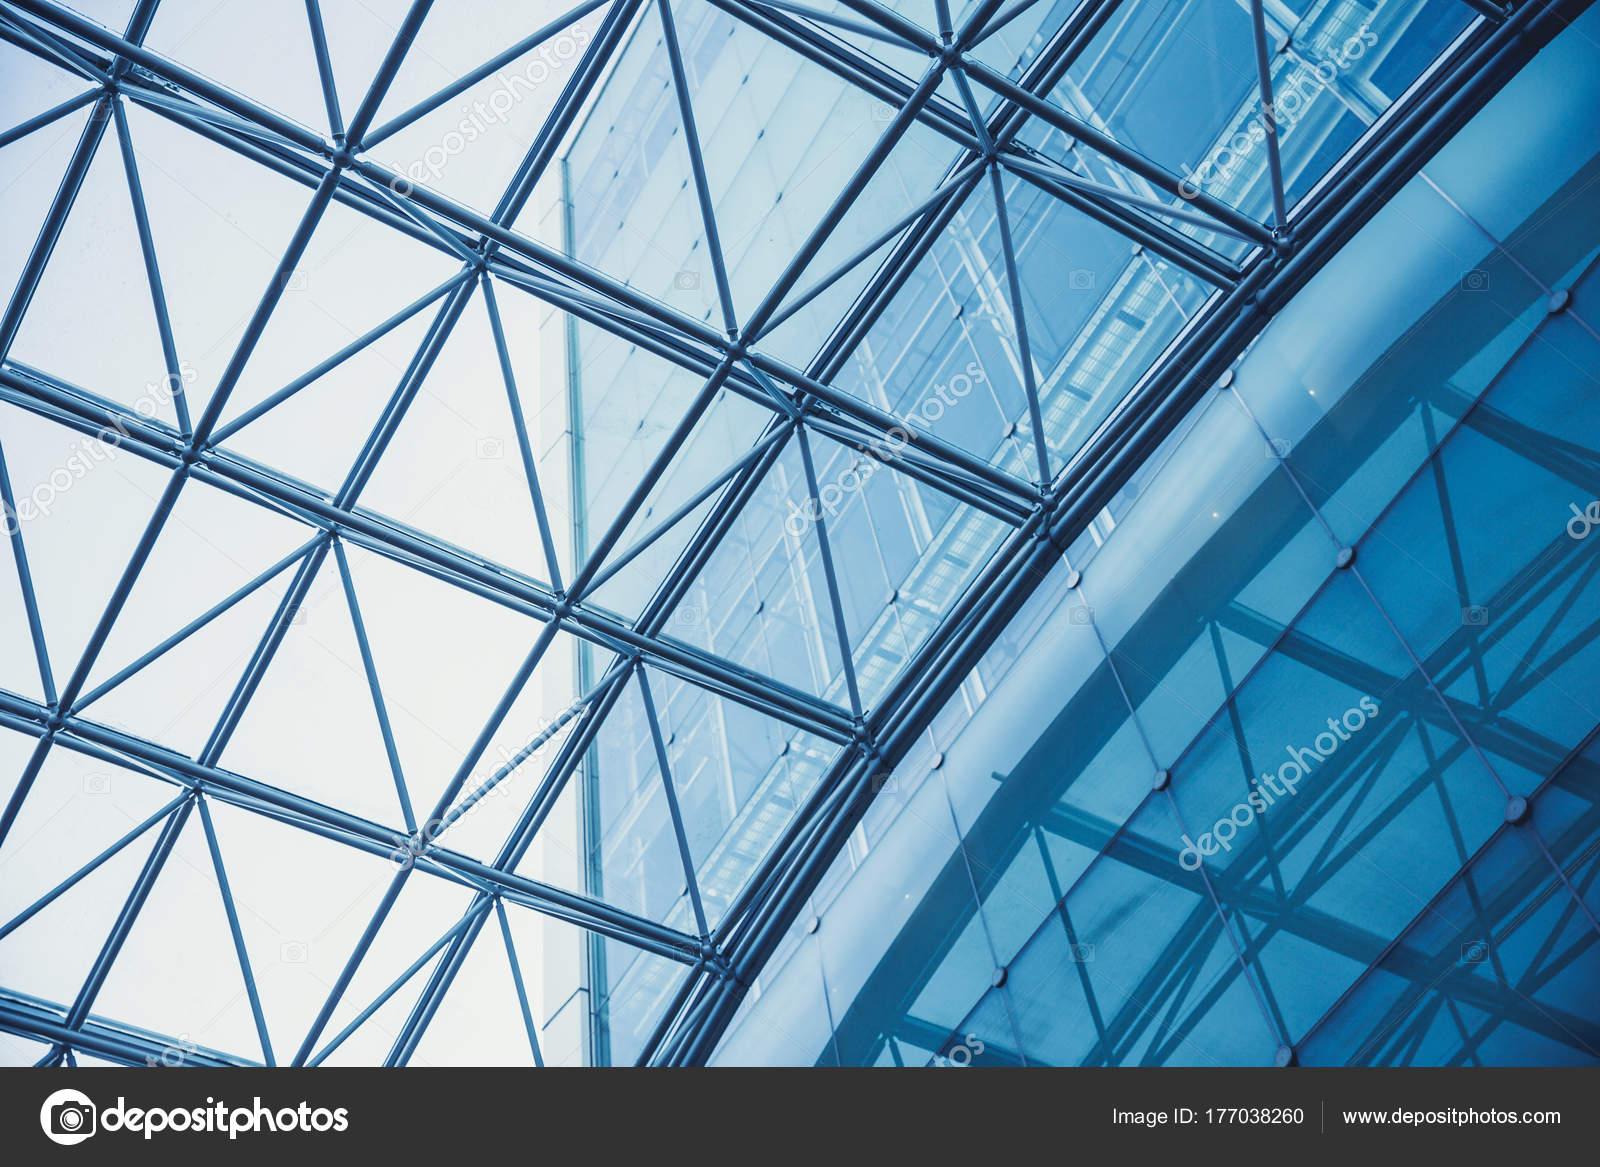 Modernes Gebäude Glasdach Metall Rahmenkonstruktion — Stockfoto ...